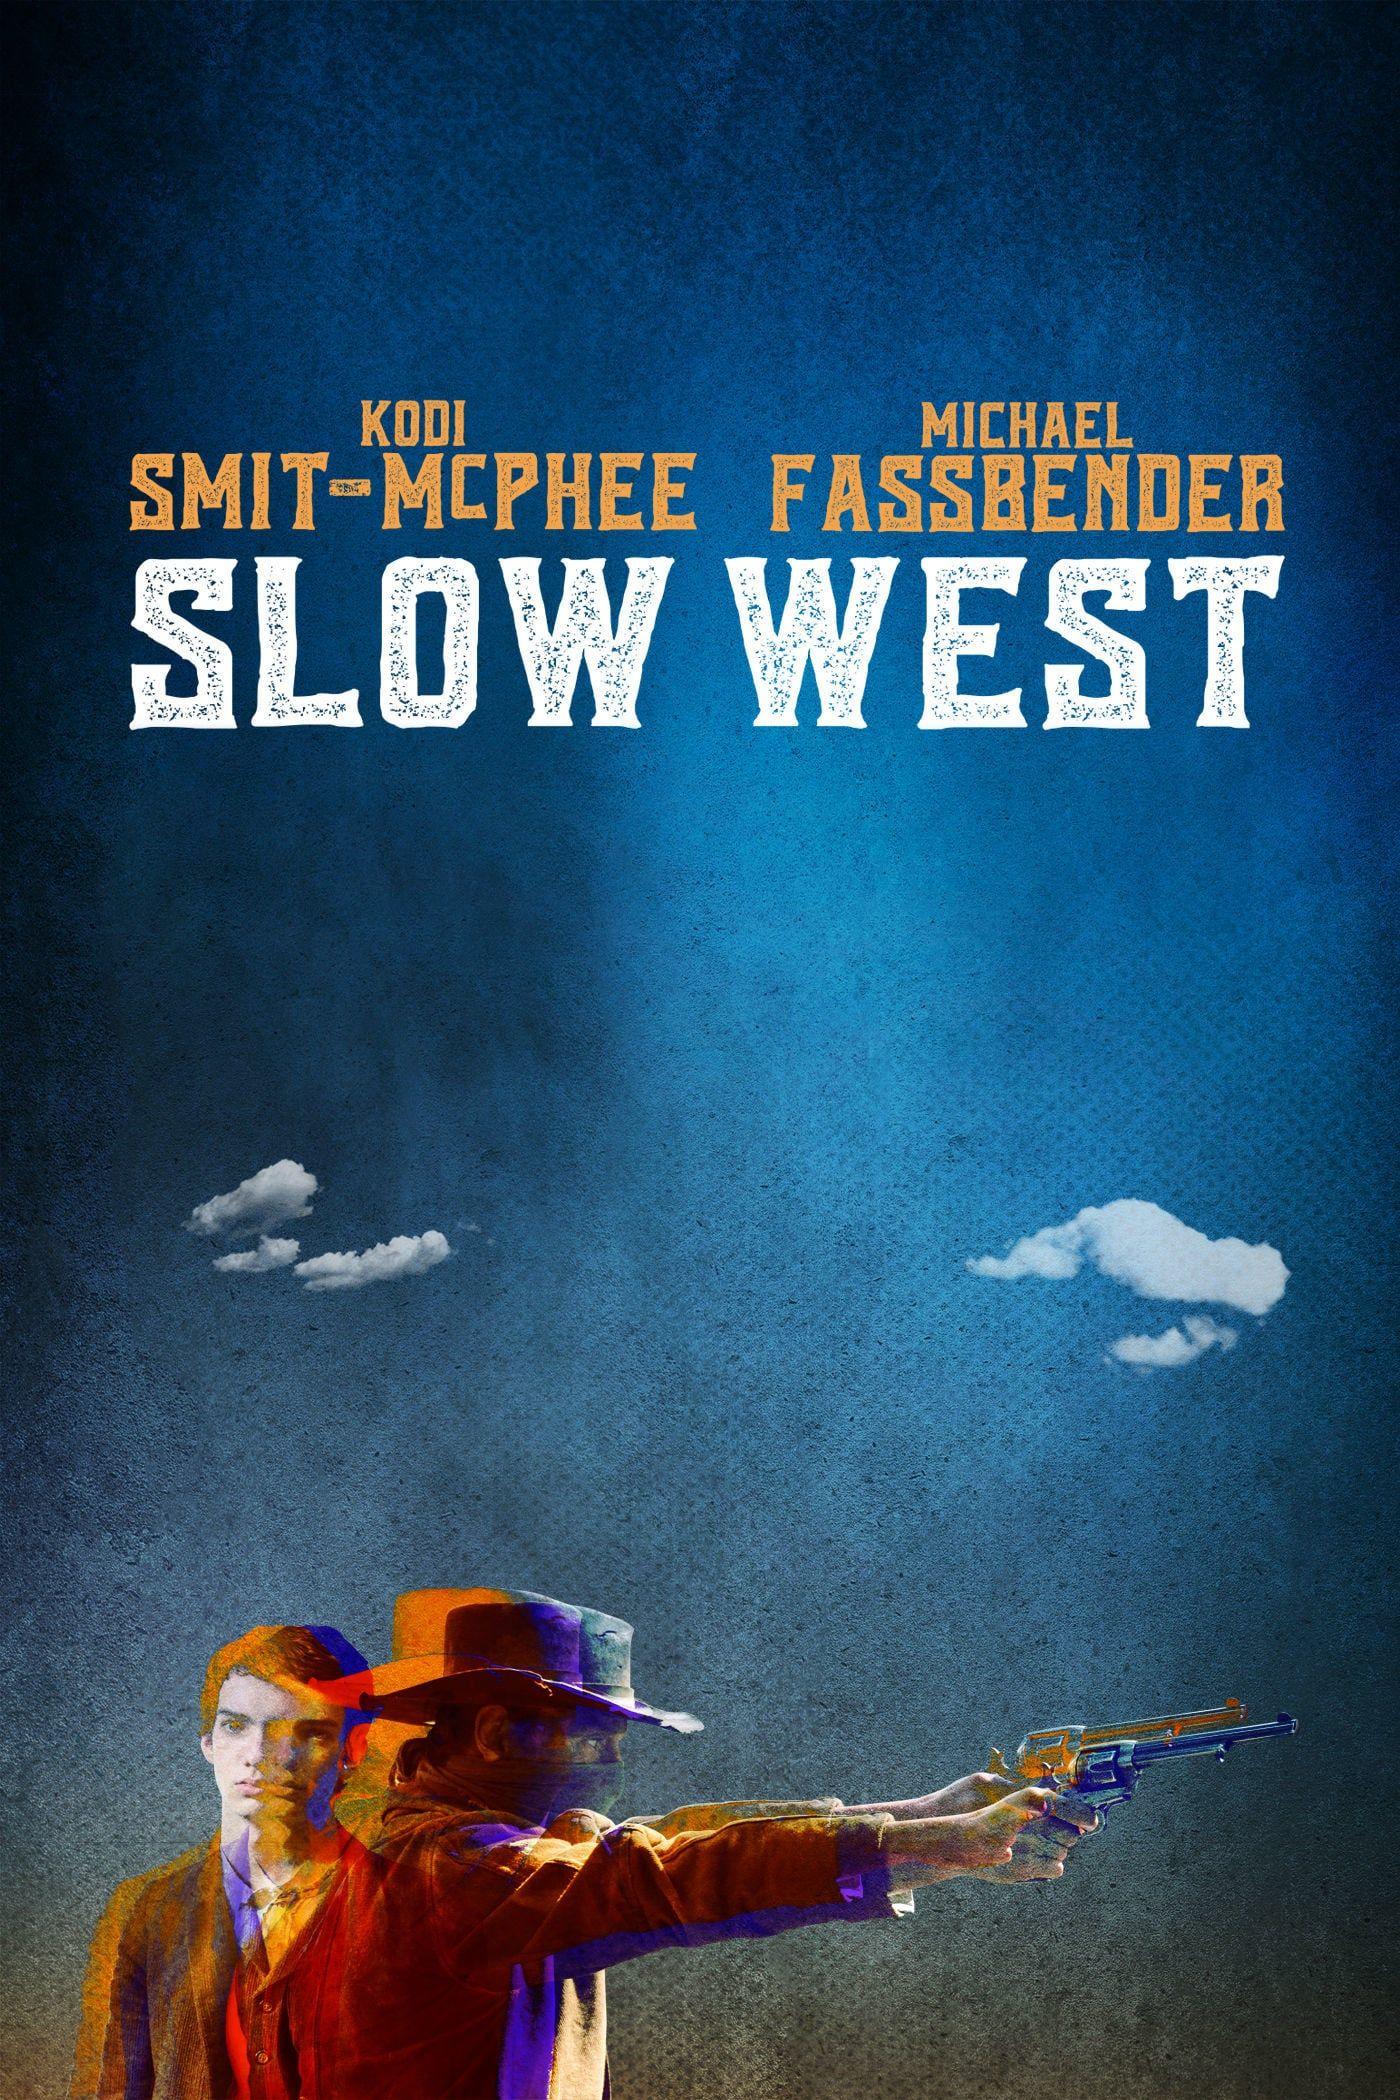 [HD1080p] Slow West FULL MOVIE HD1080p Sub English Best